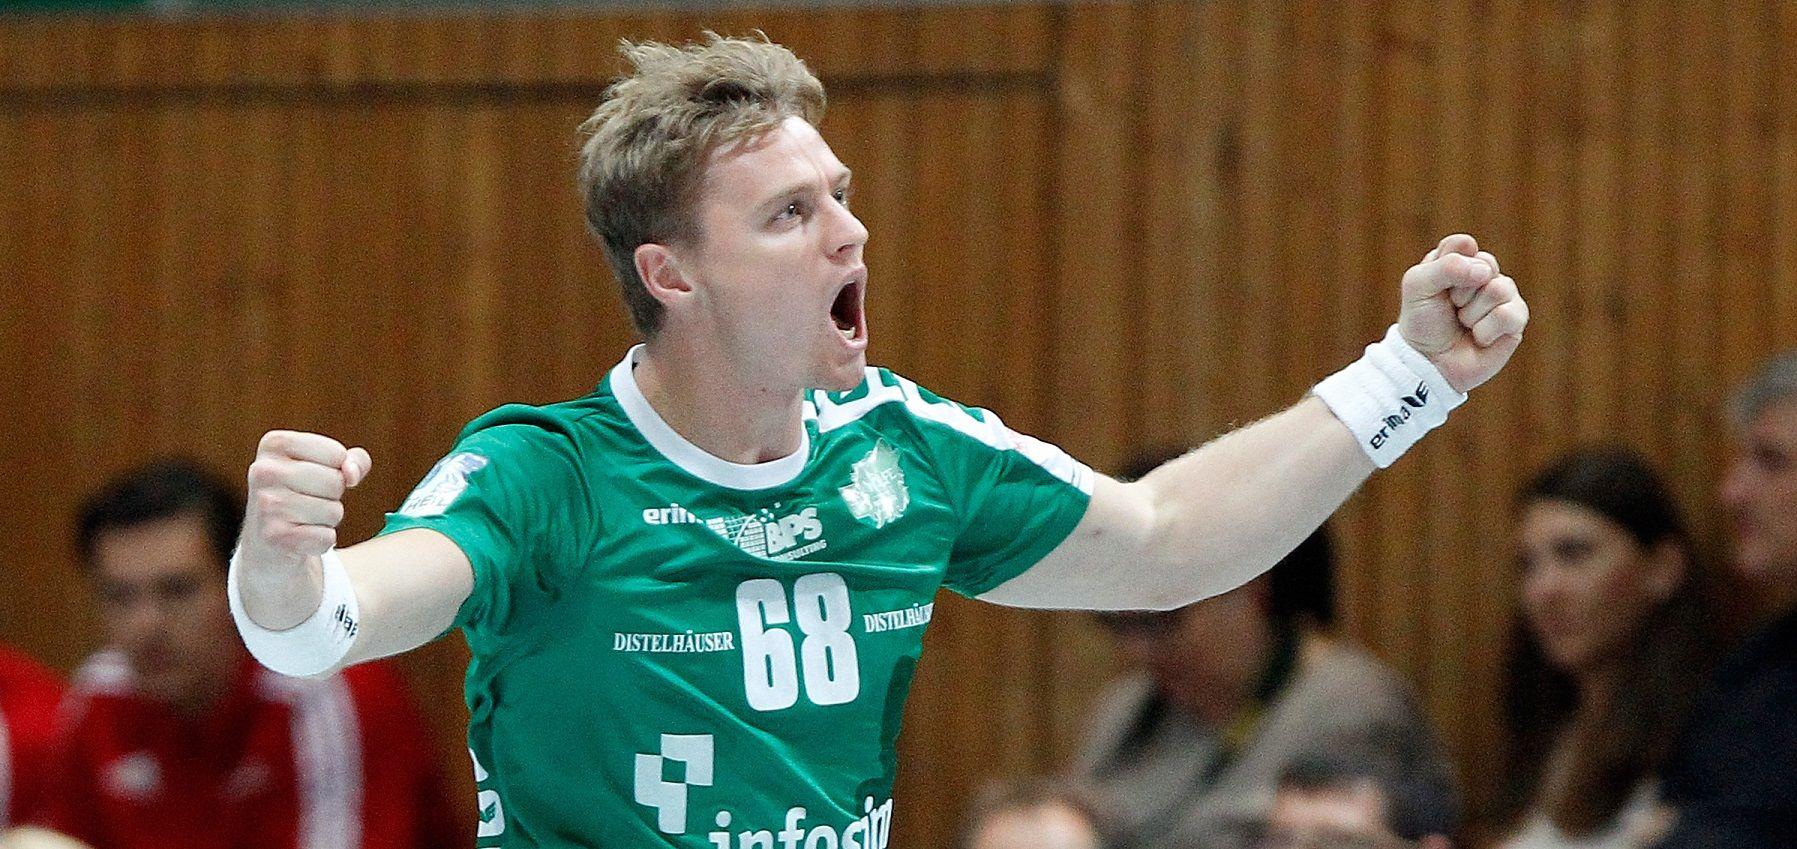 DKB 2. Handball-Bundesliga, DJK Rimpar Wölfe - TSG Lu-Friesenheim